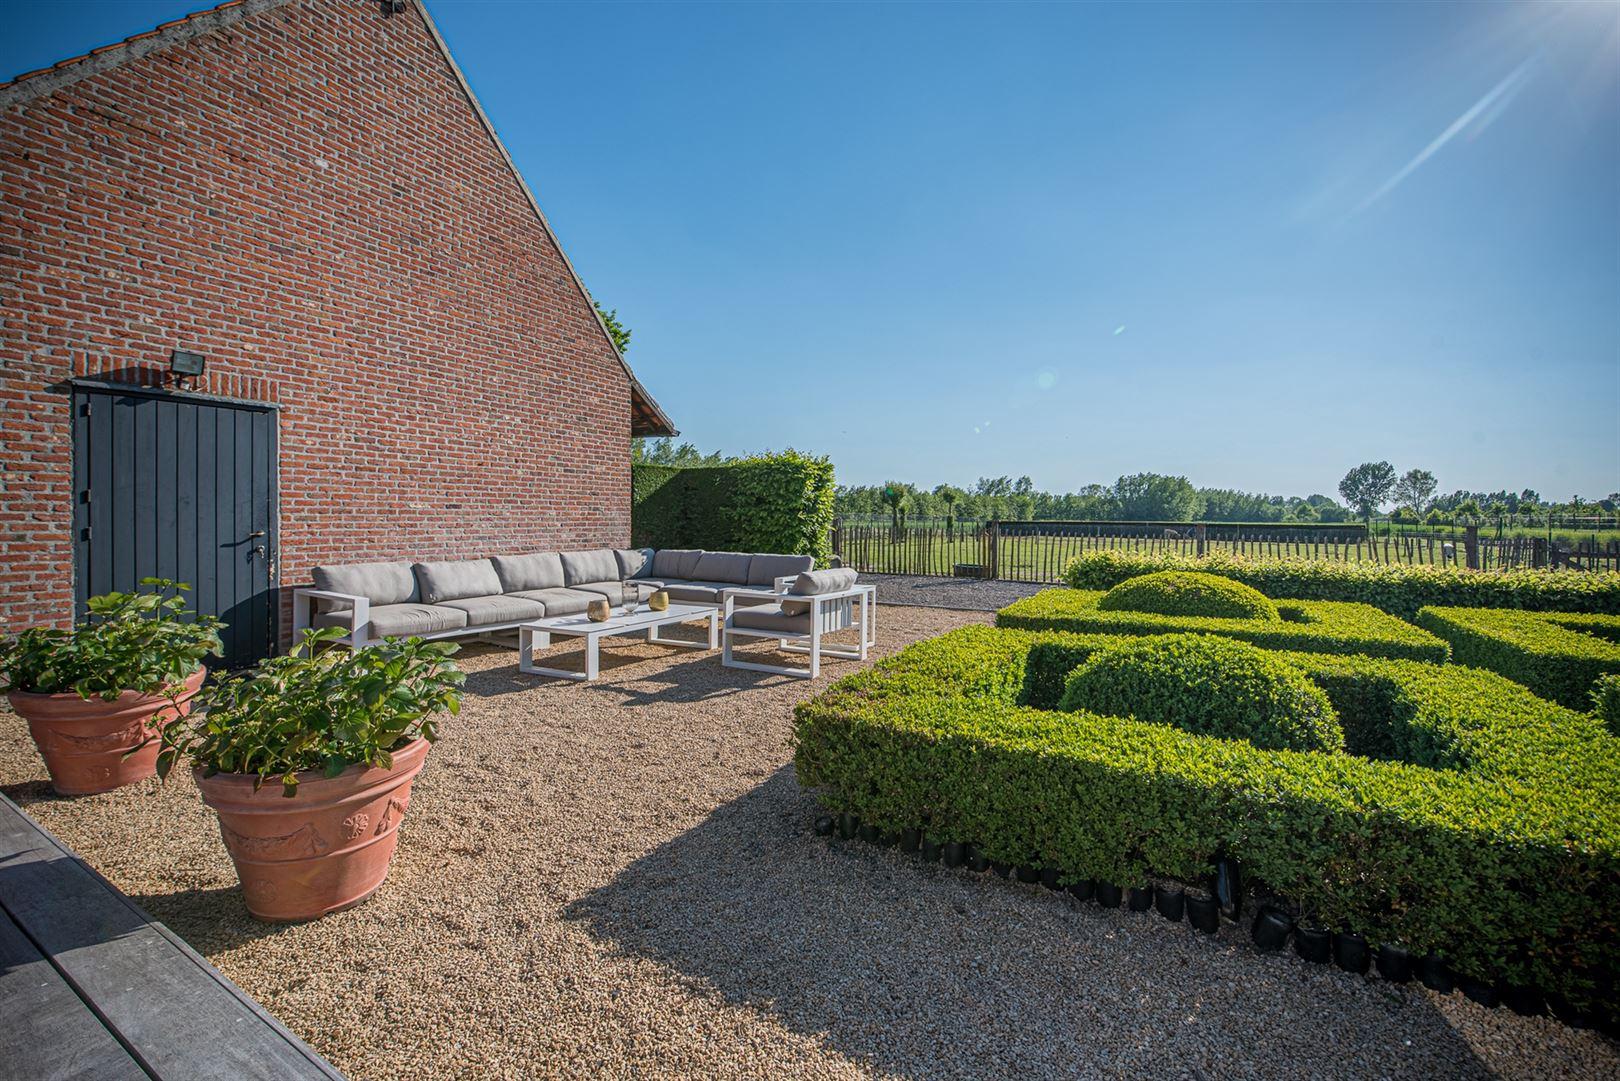 Foto 22 : Handelspand te 9160 LOKEREN (België) - Prijs € 1.400.000